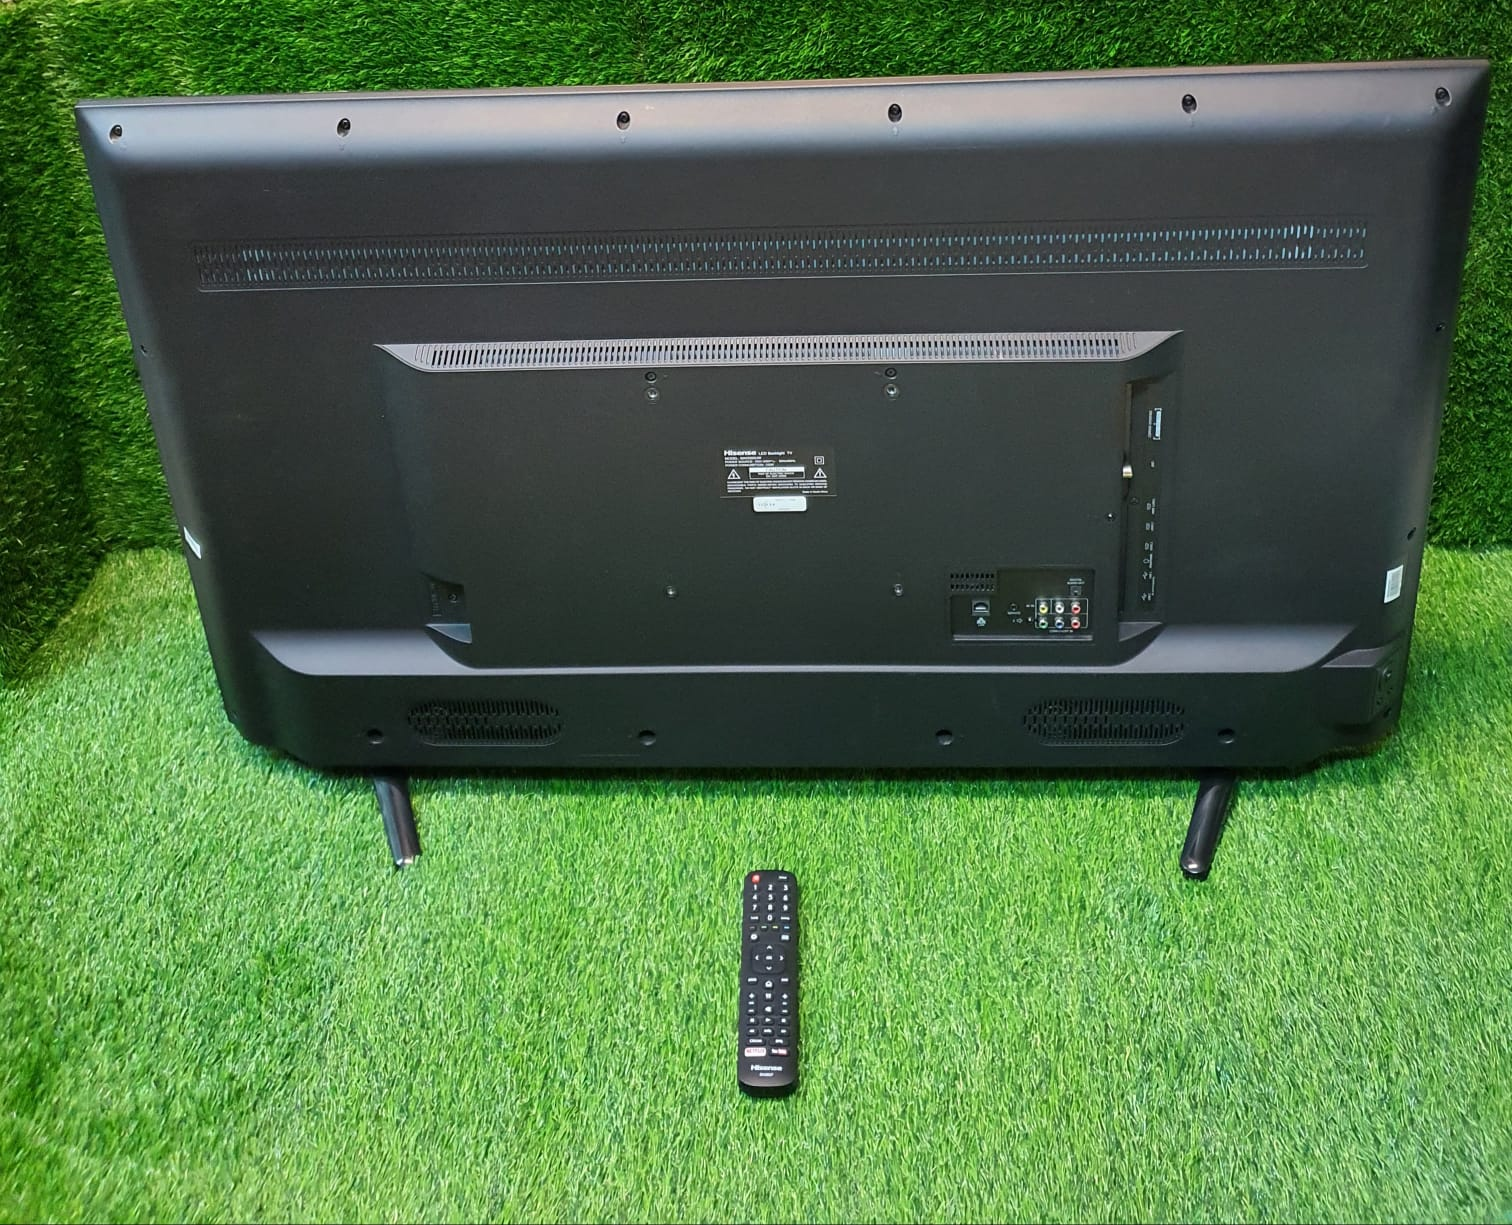 Hisense 50 inch uhd smart led tv as new